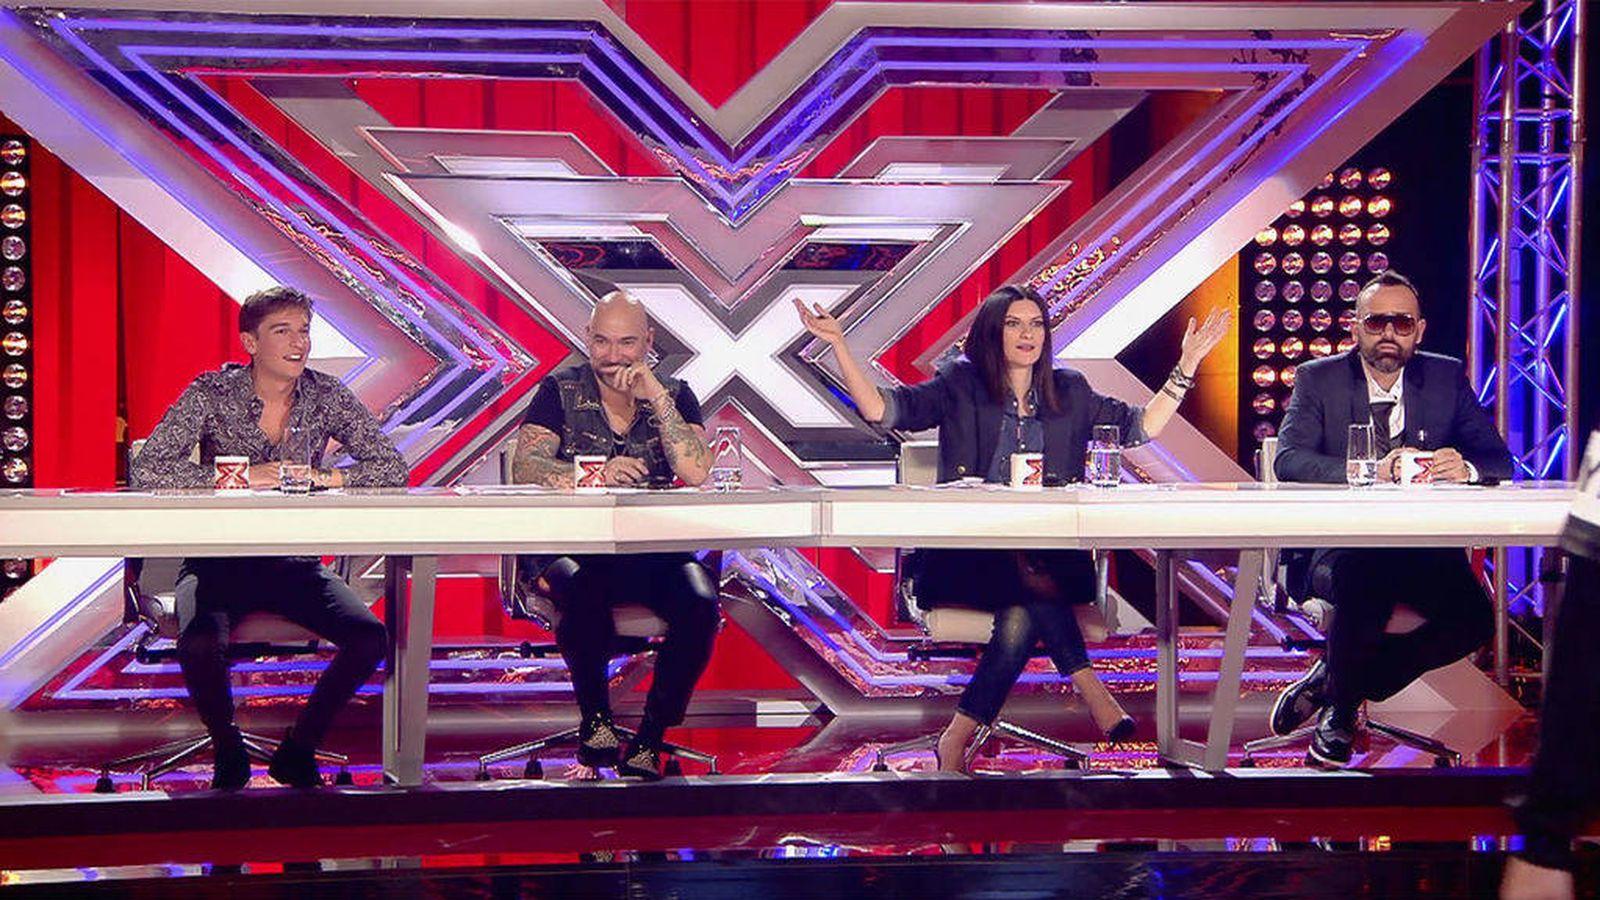 Foto: Xavi Martínez, Fernando Montesinos, Laura Pausini y Risto Mejide en 'Factor X'. (Mediaset)